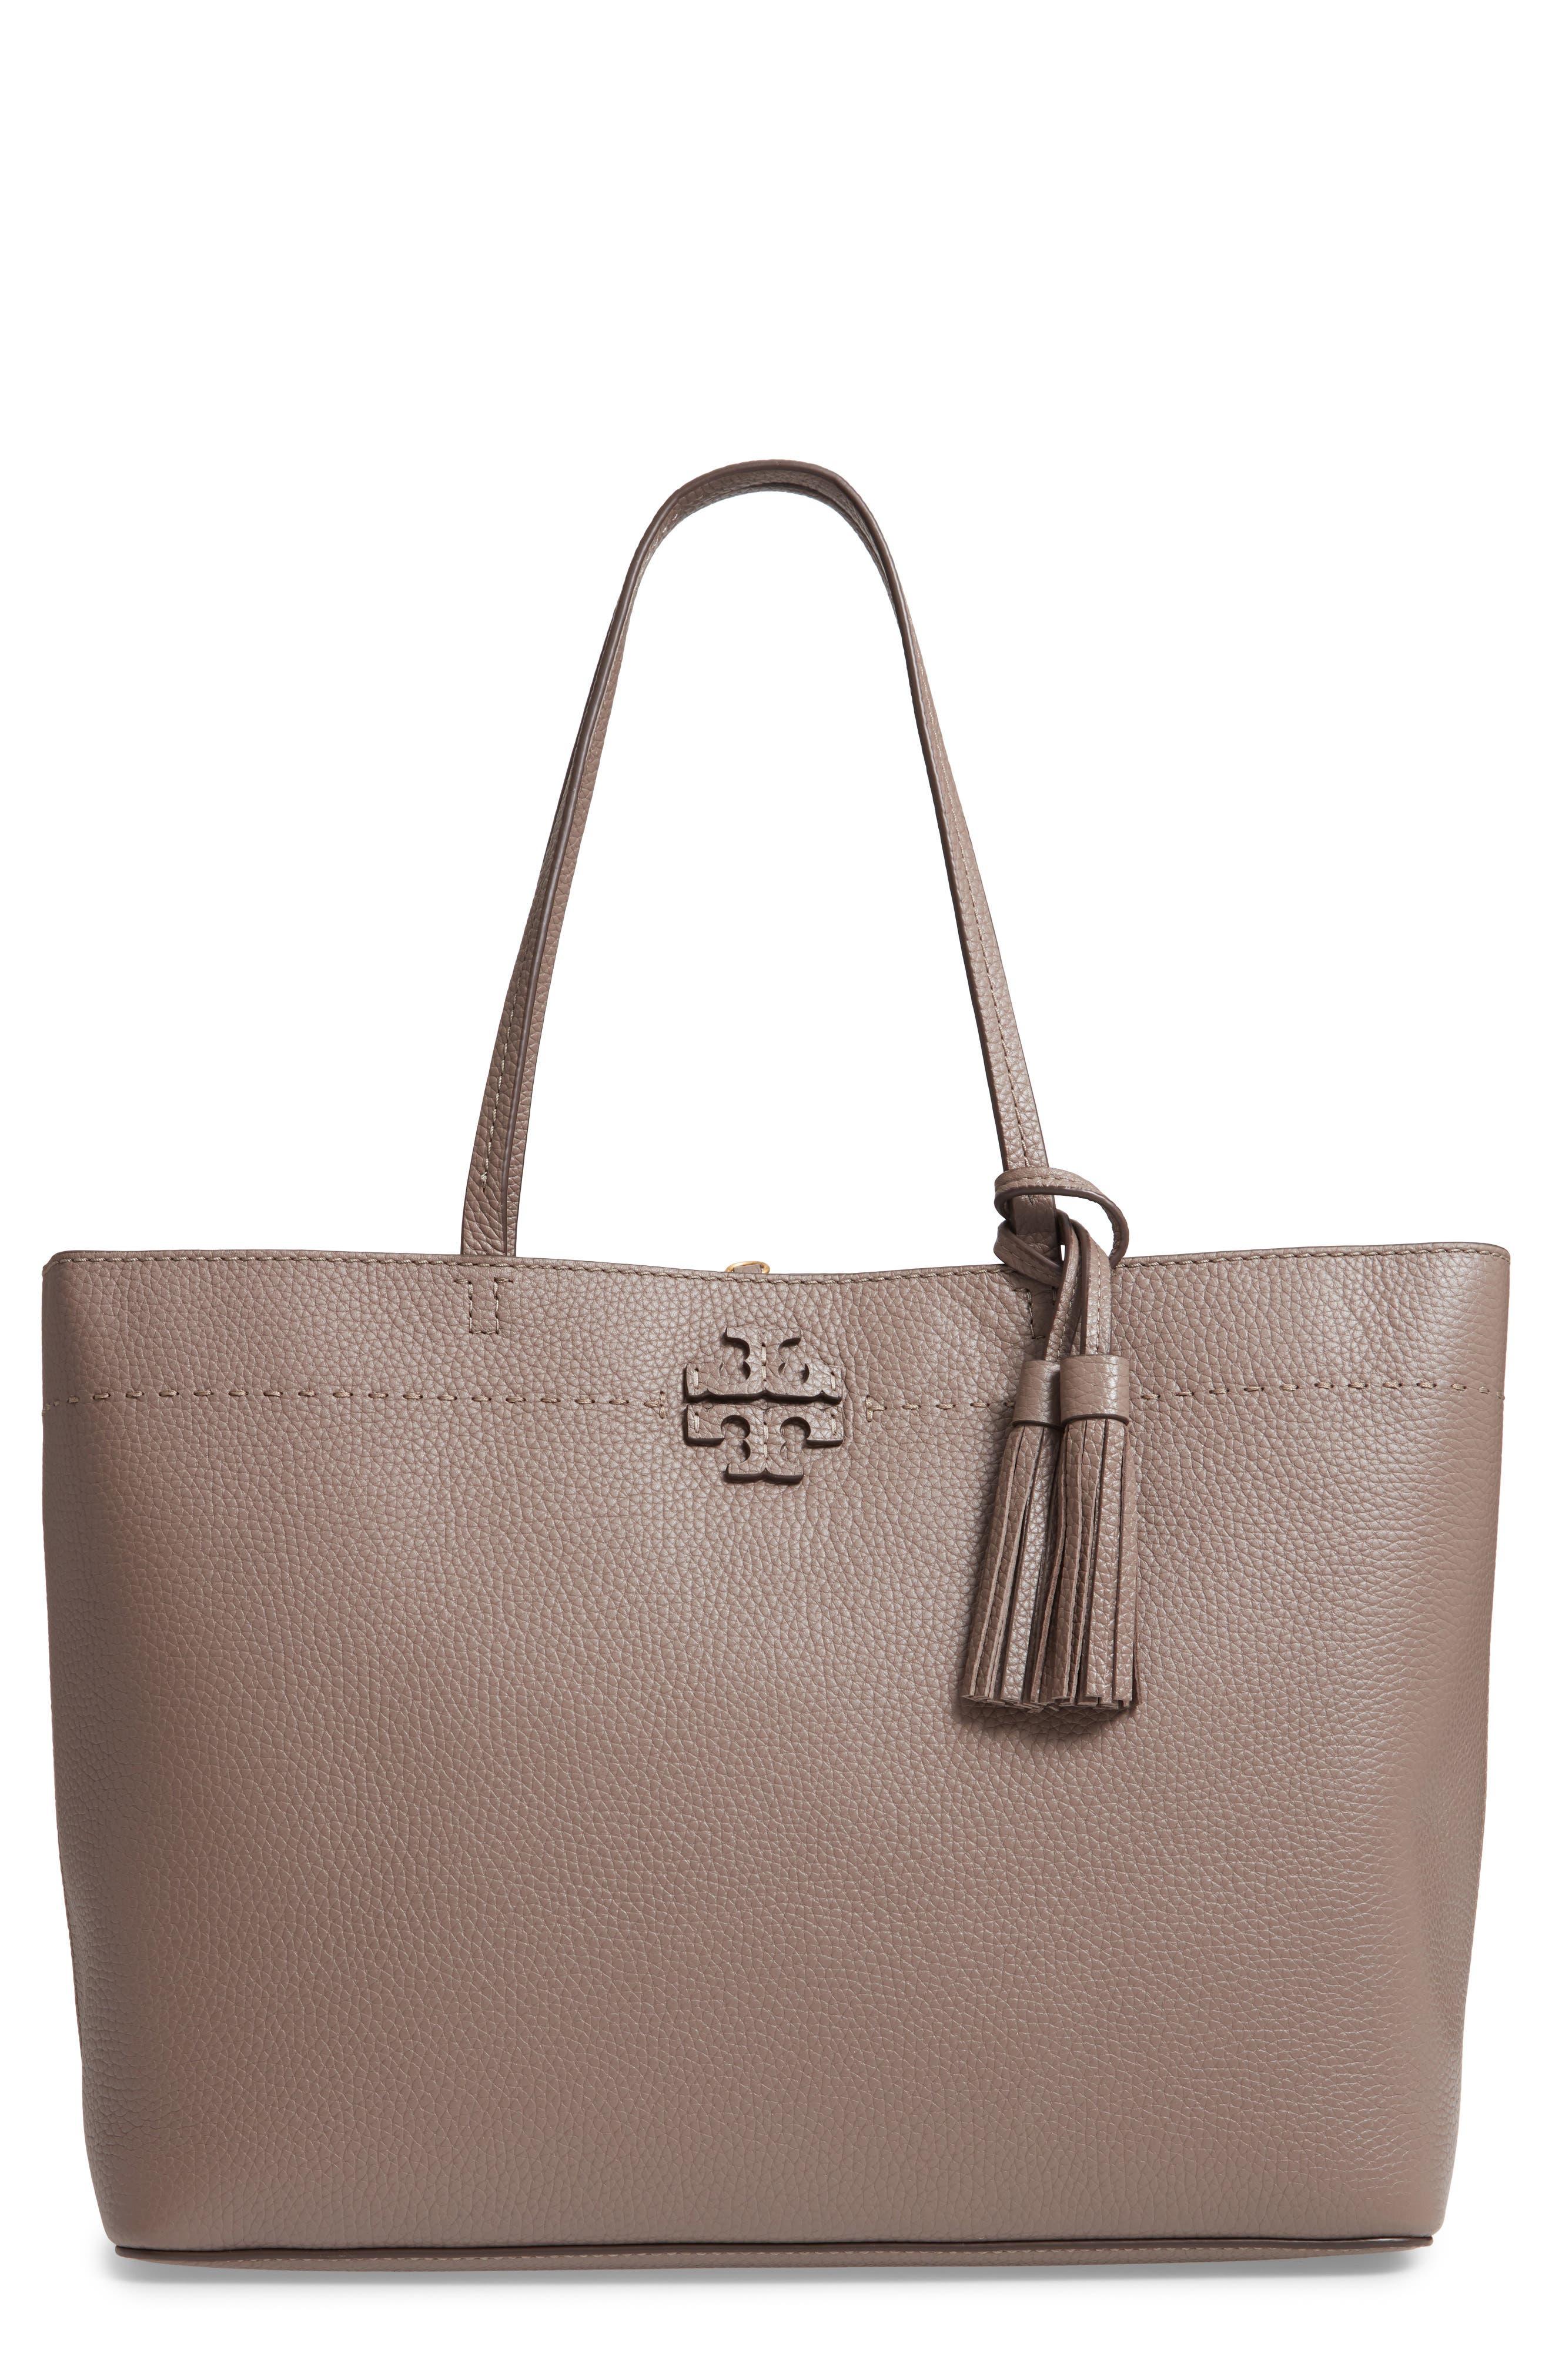 295e85f0608 Tory Burch Handbags   Wallets